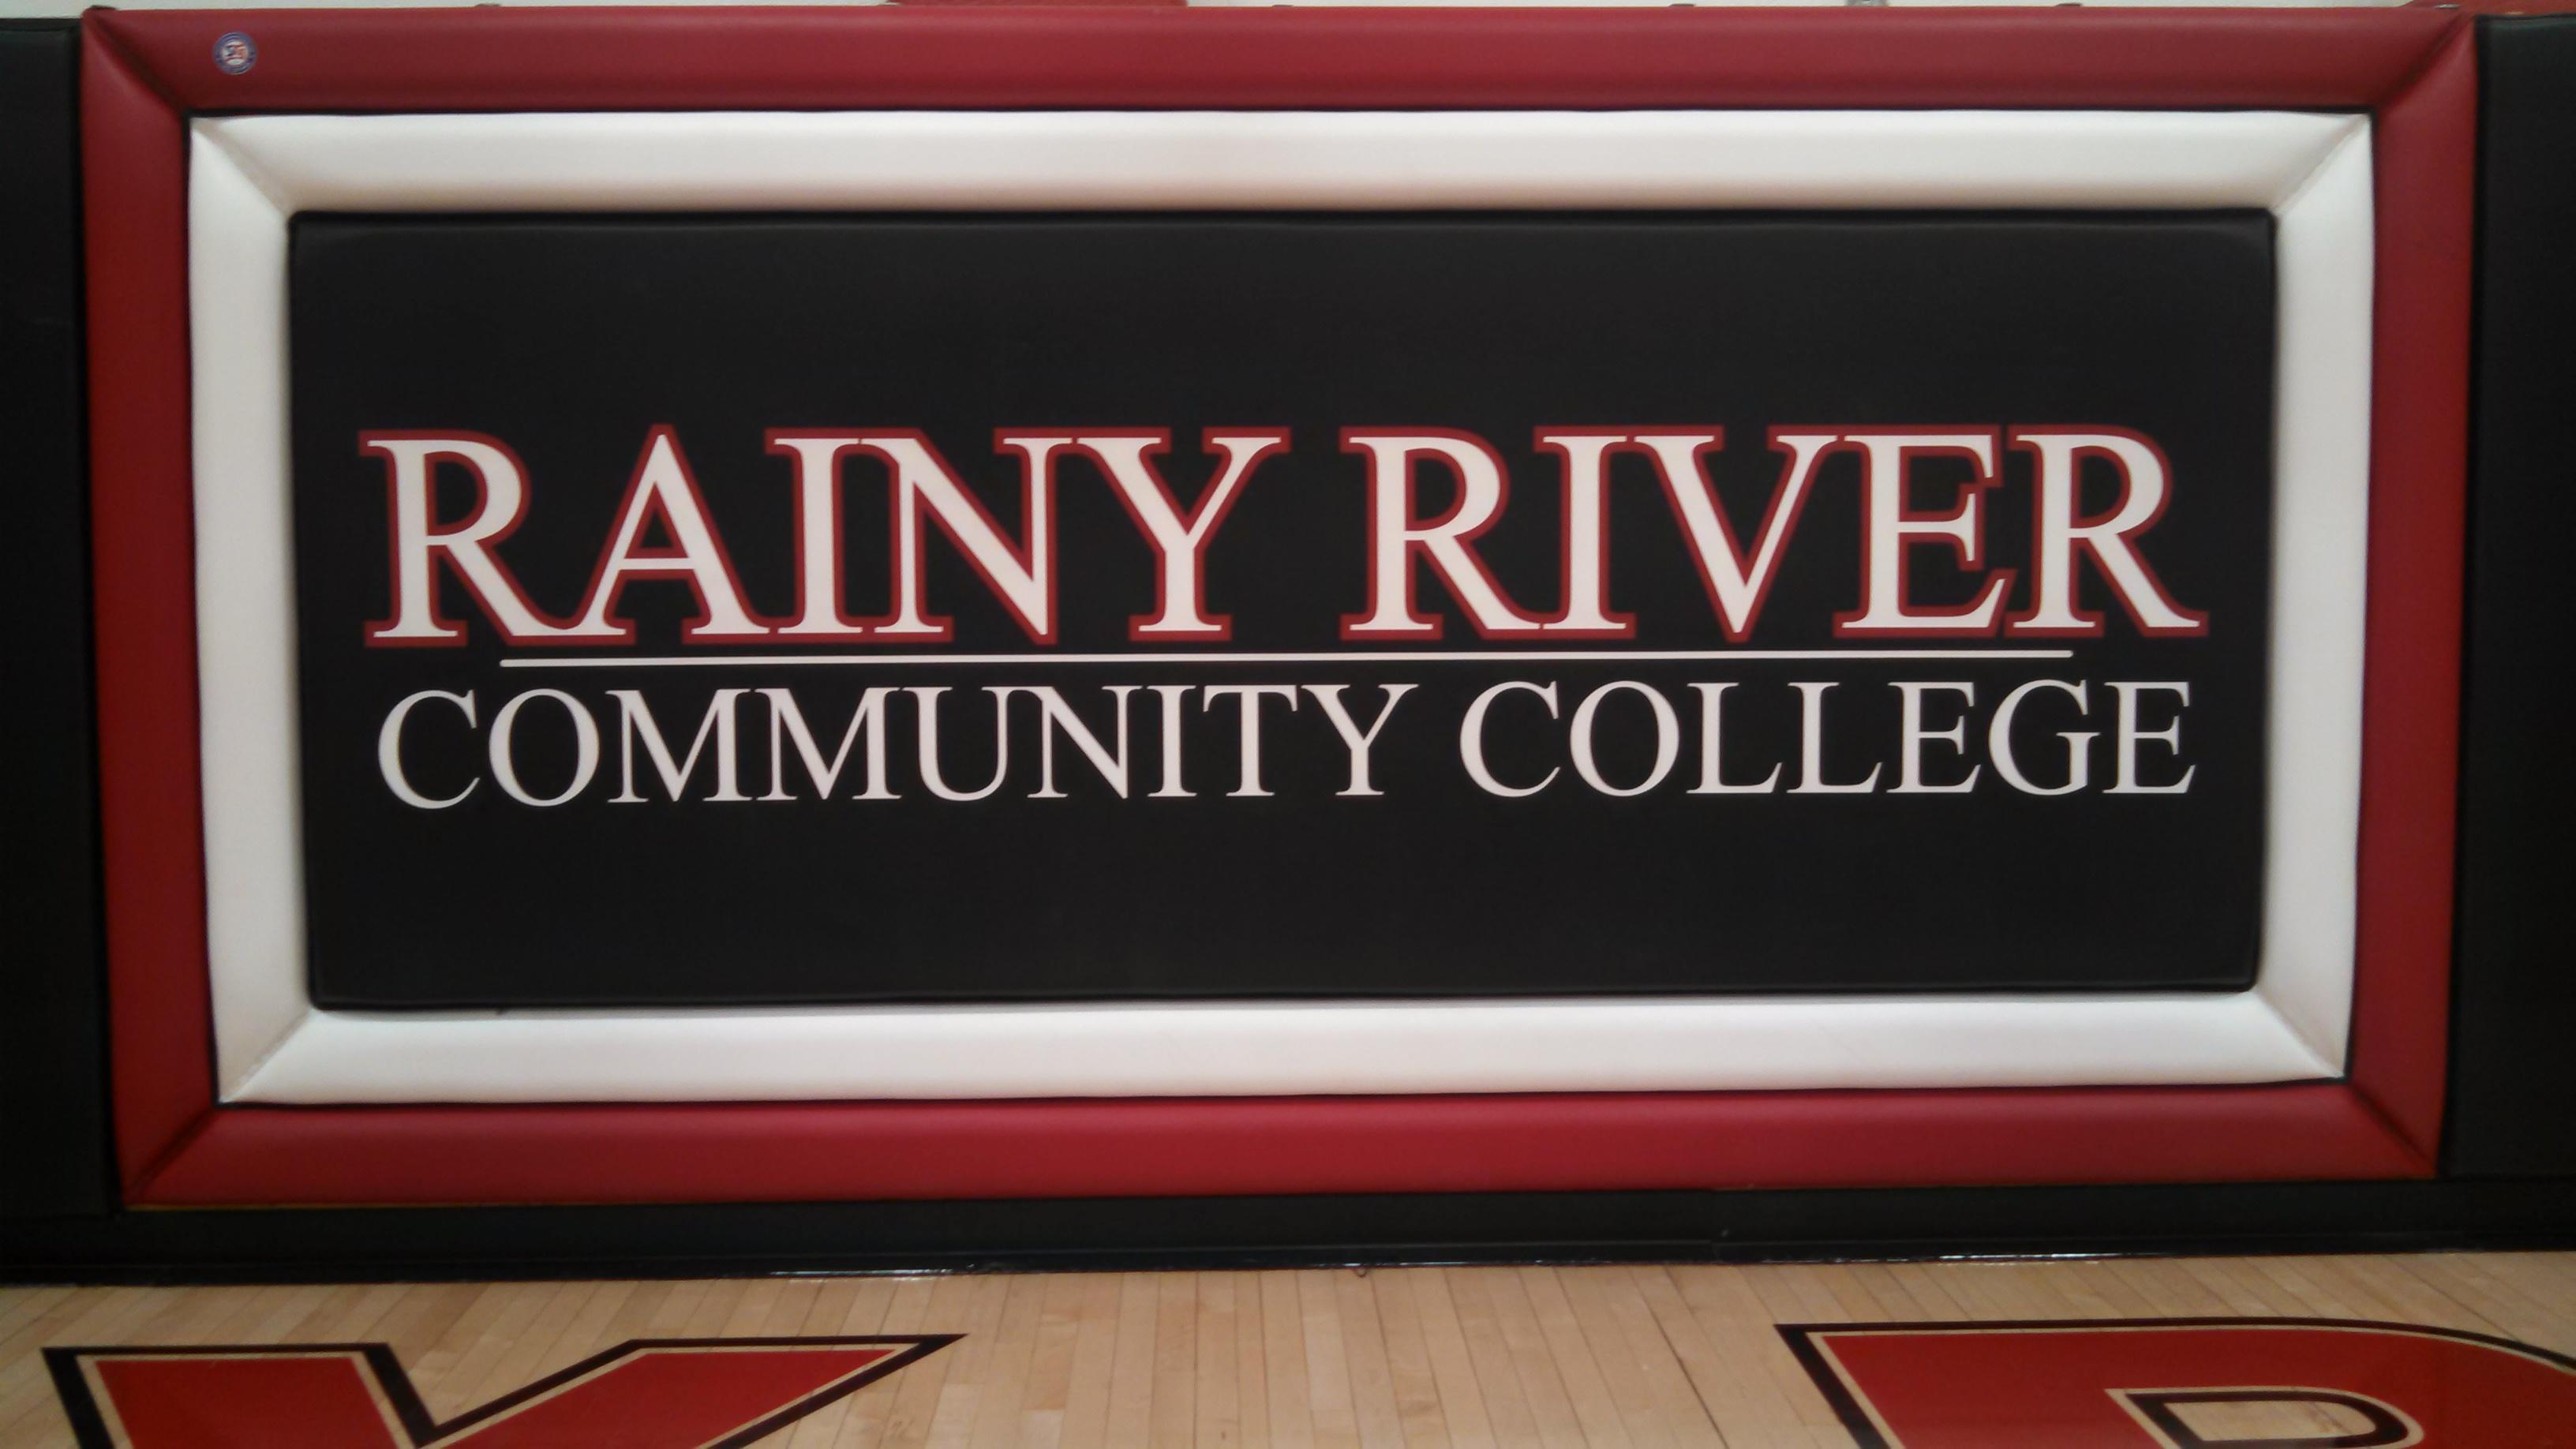 rainy river community coll - HD3264×1836